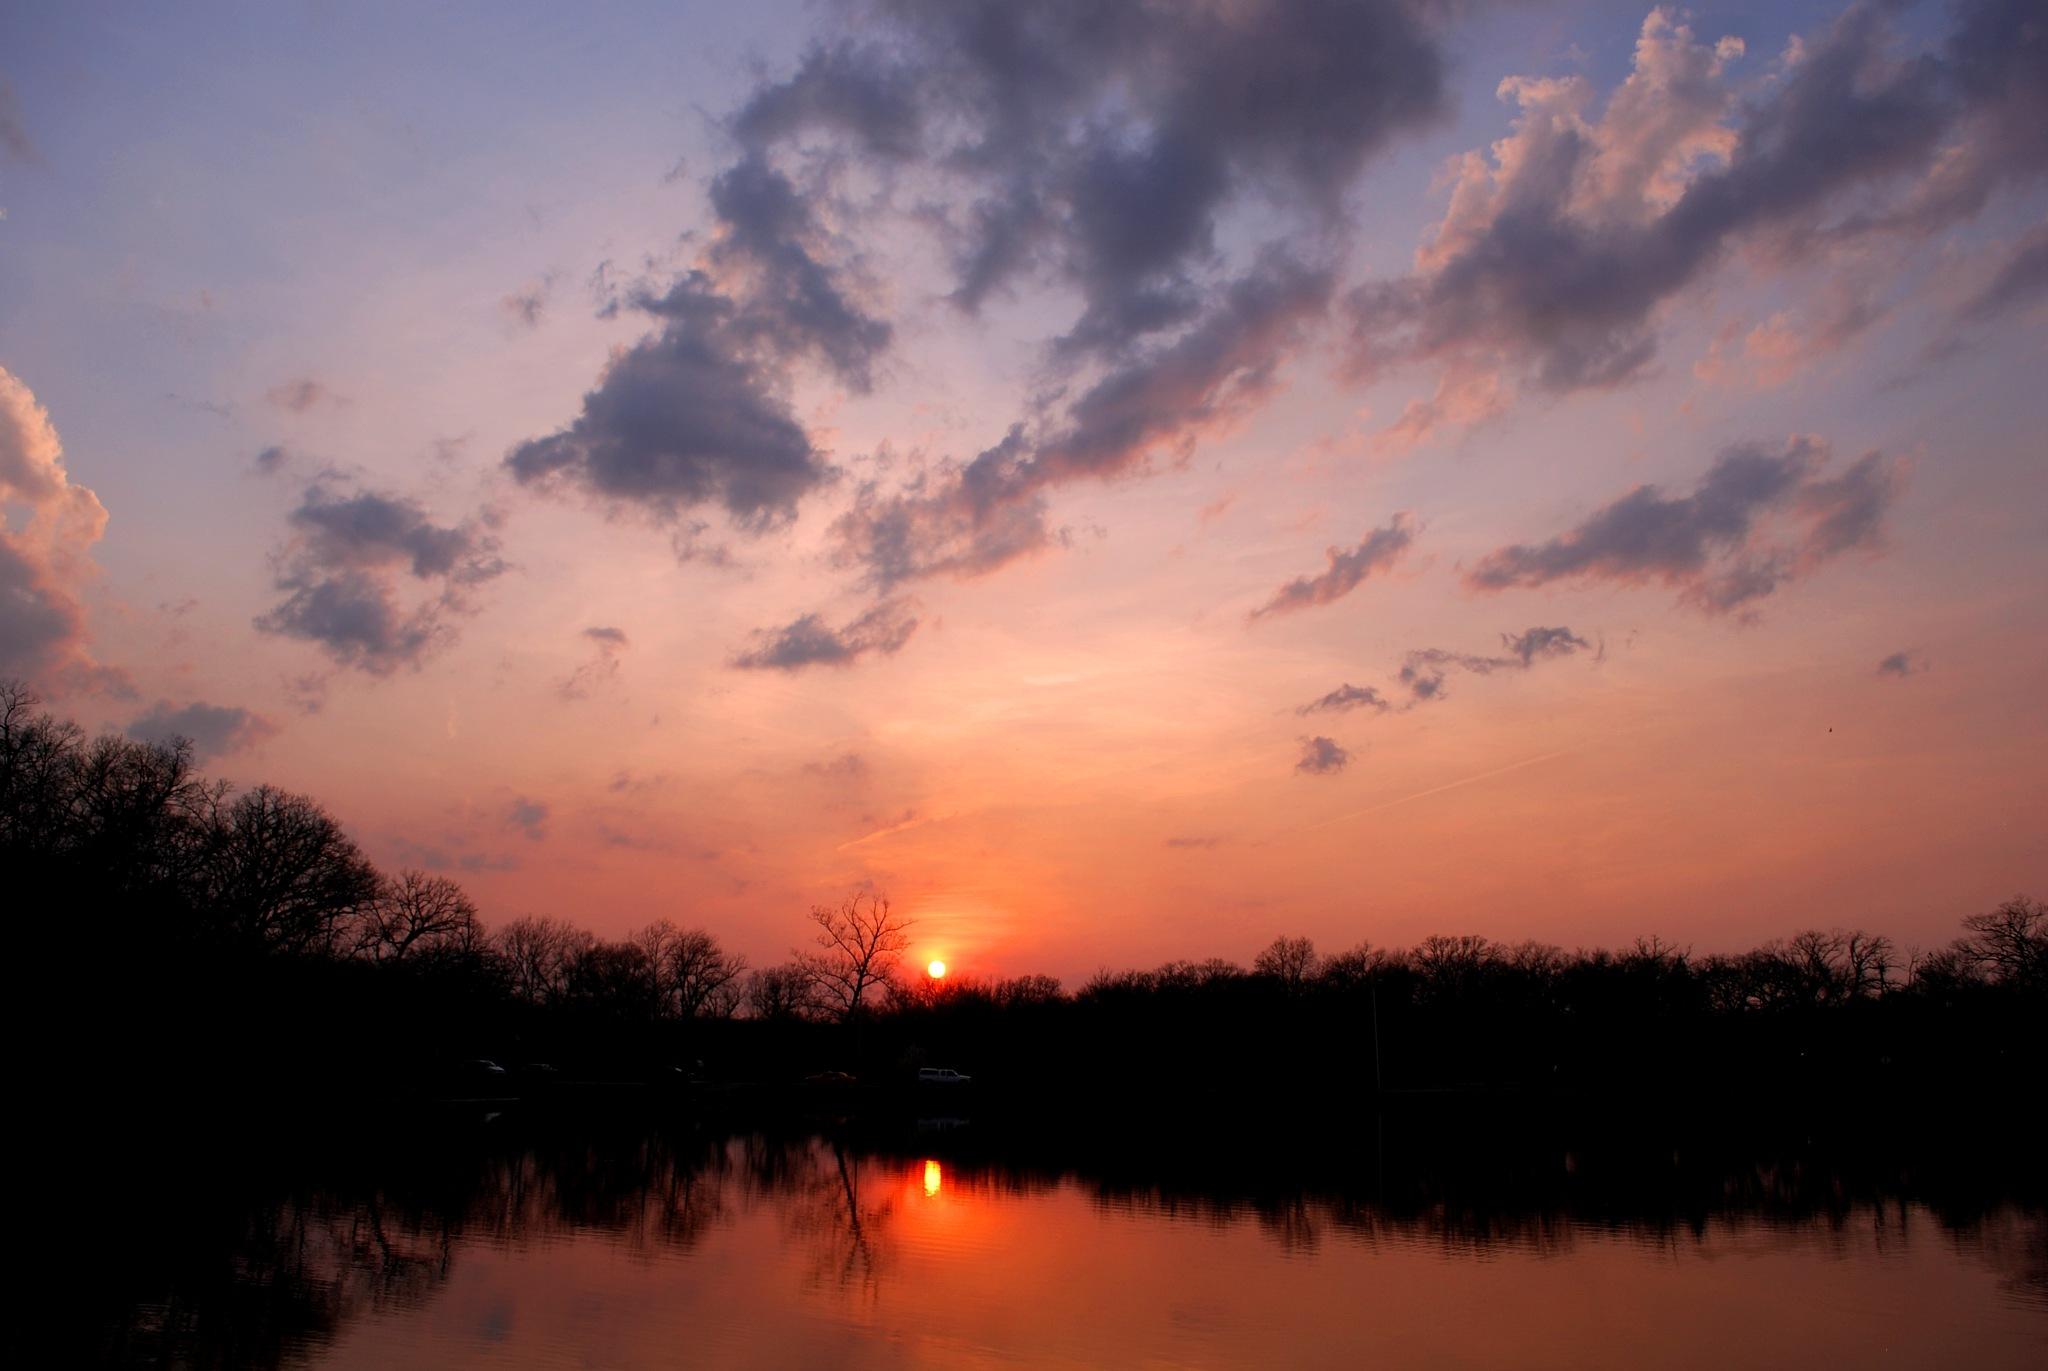 Sunset over the lake by mattharang